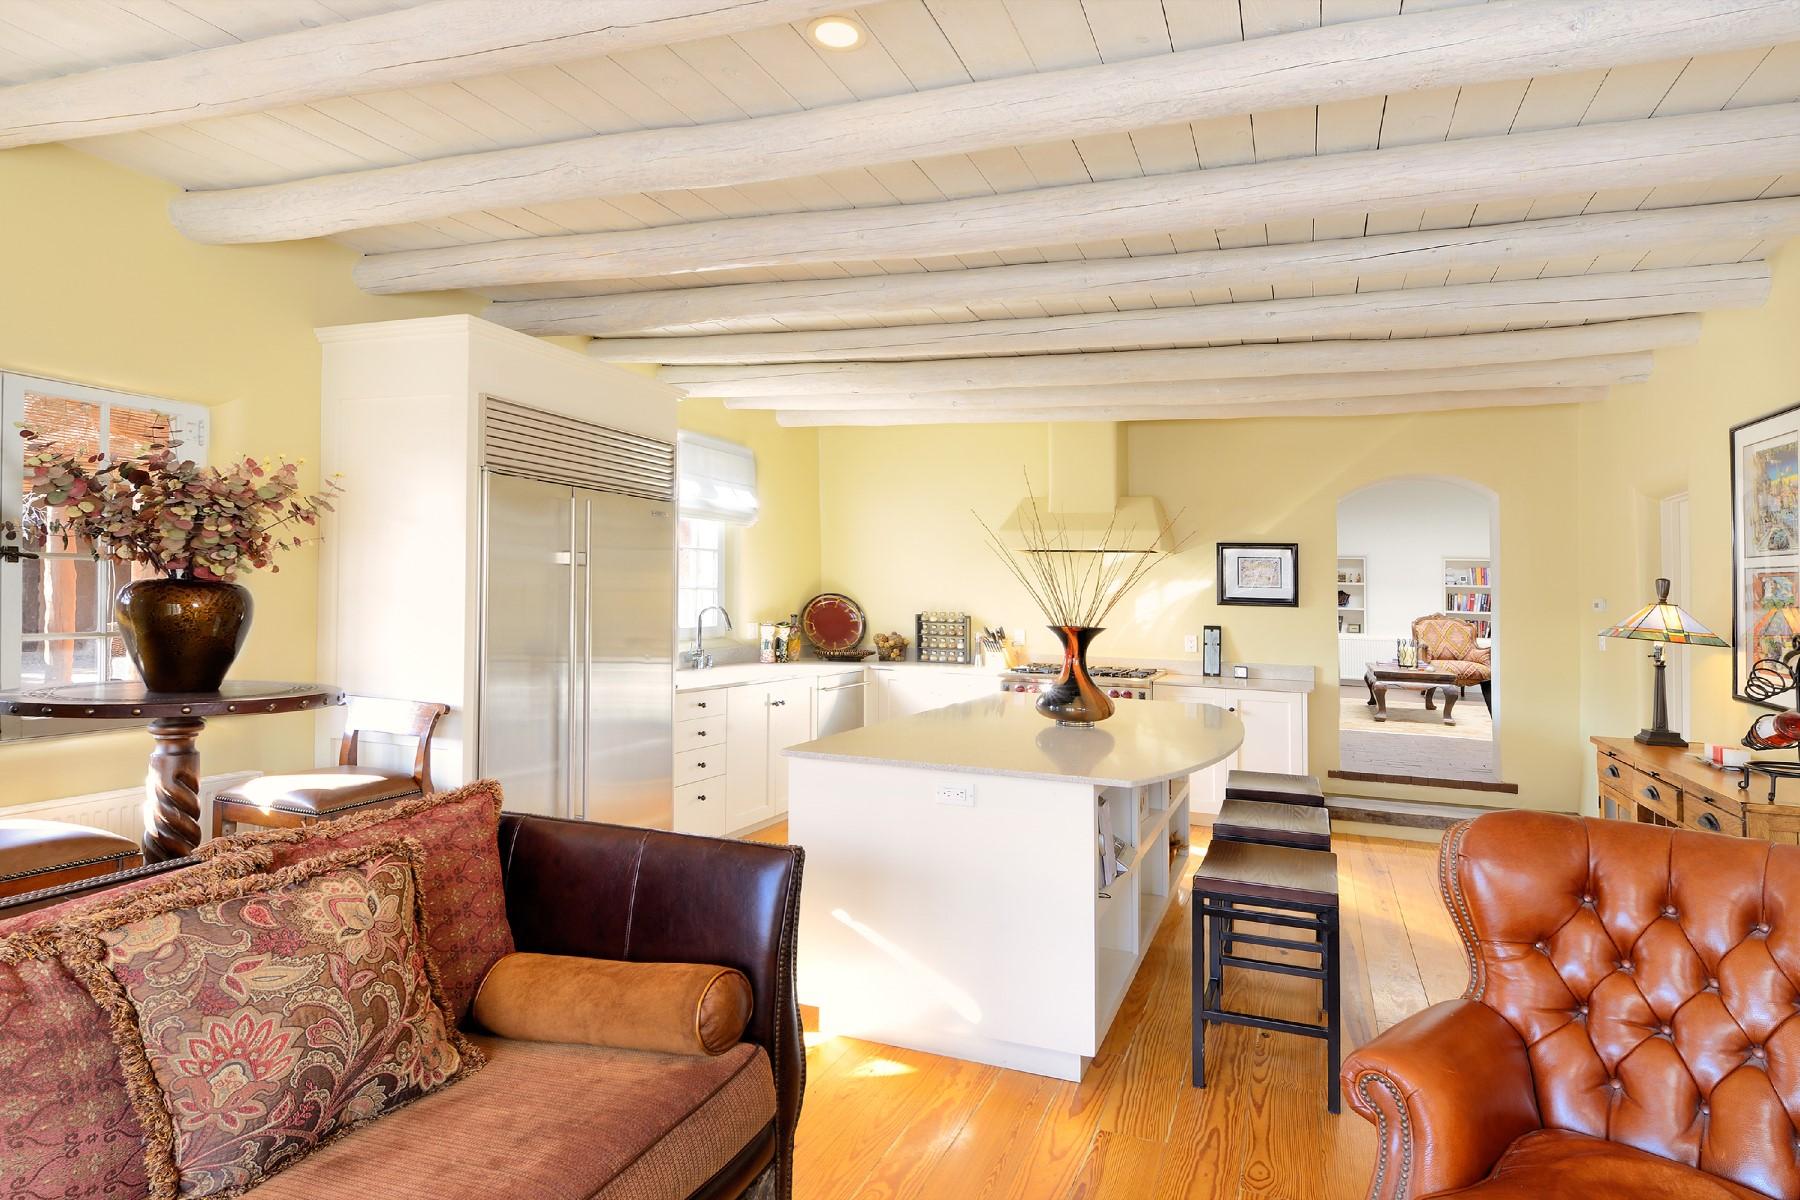 Single Family Home for Sale at 525 Hillside Avenue Santa Fe City Southeast, Santa Fe, New Mexico, 87501 United States